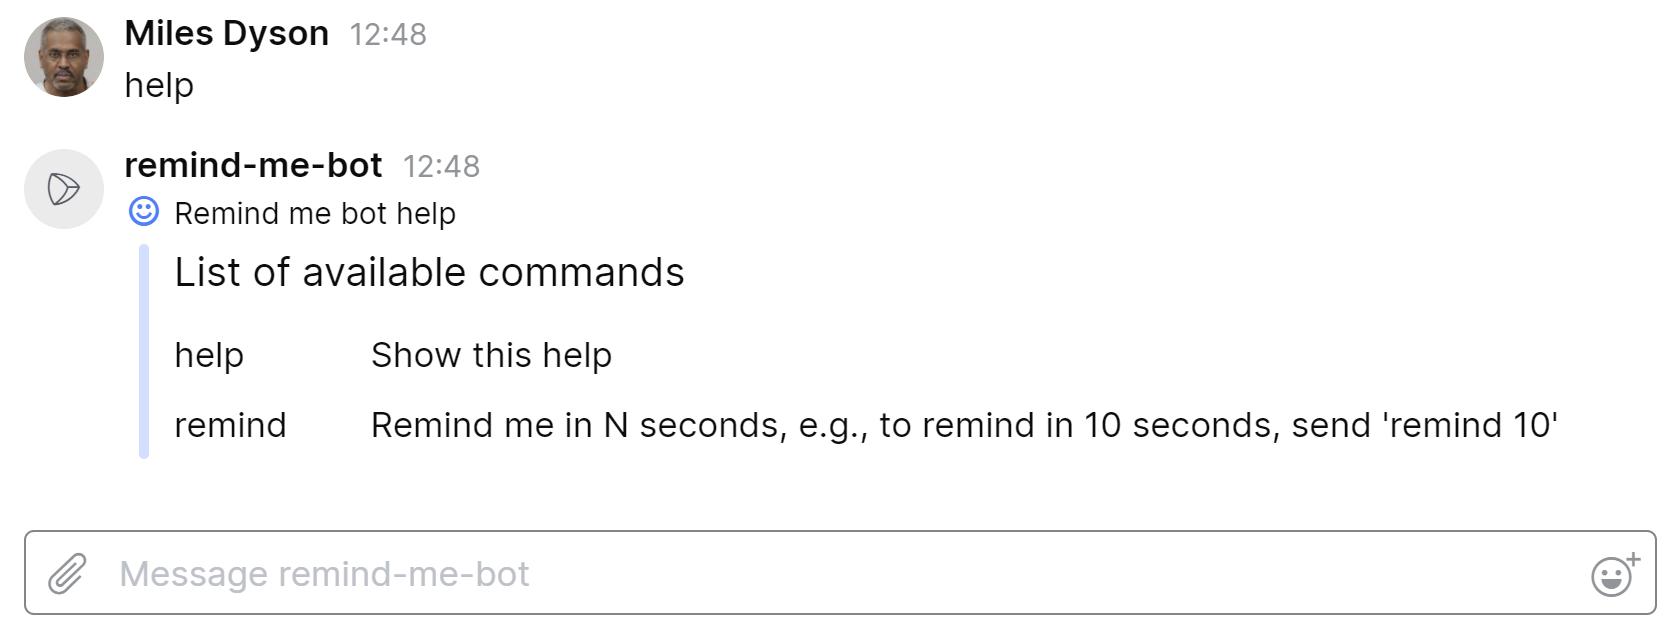 Help command